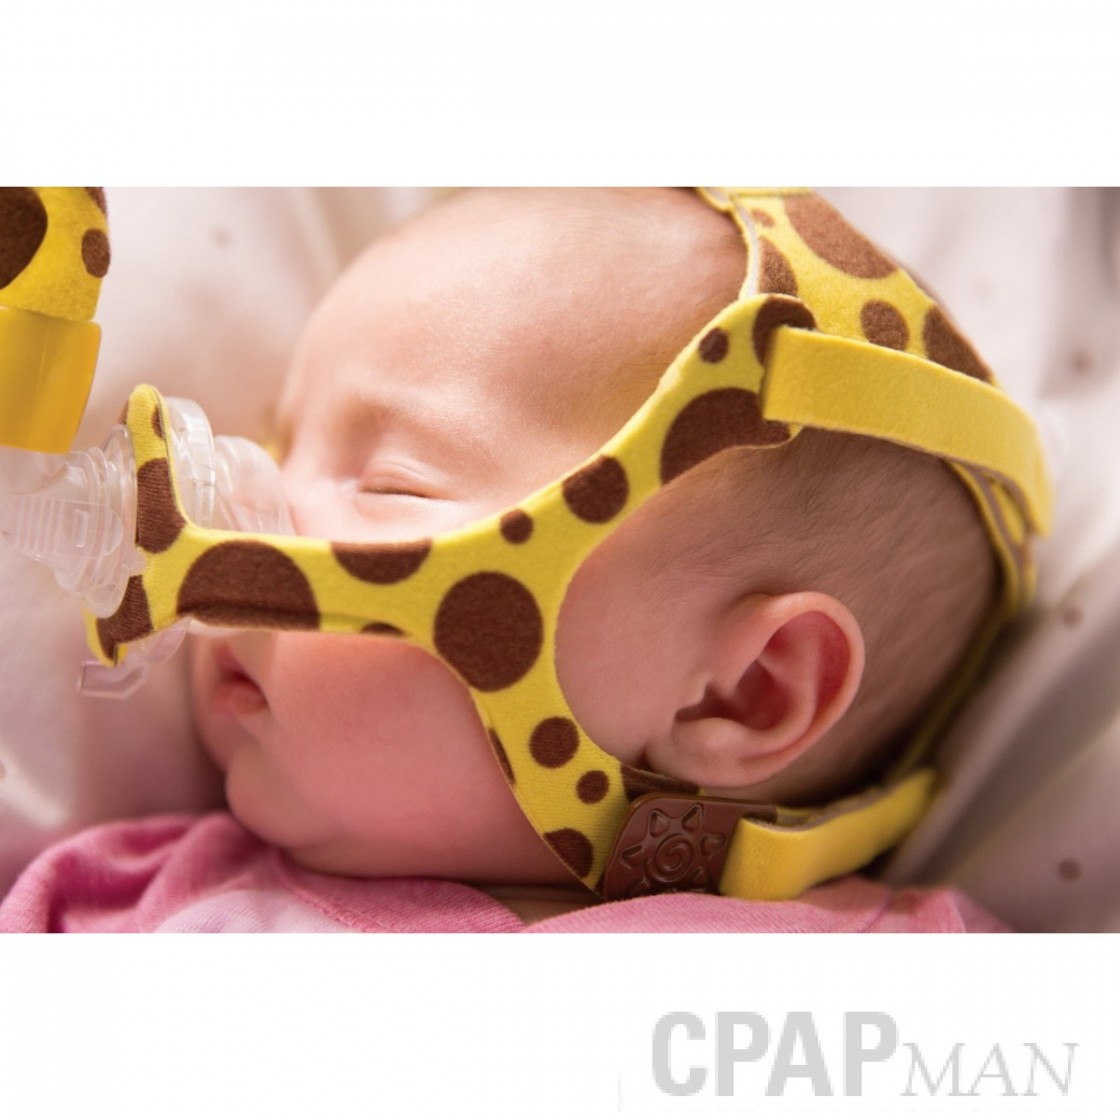 Wisp Pediatric Nasal CPAP Mask - Philips